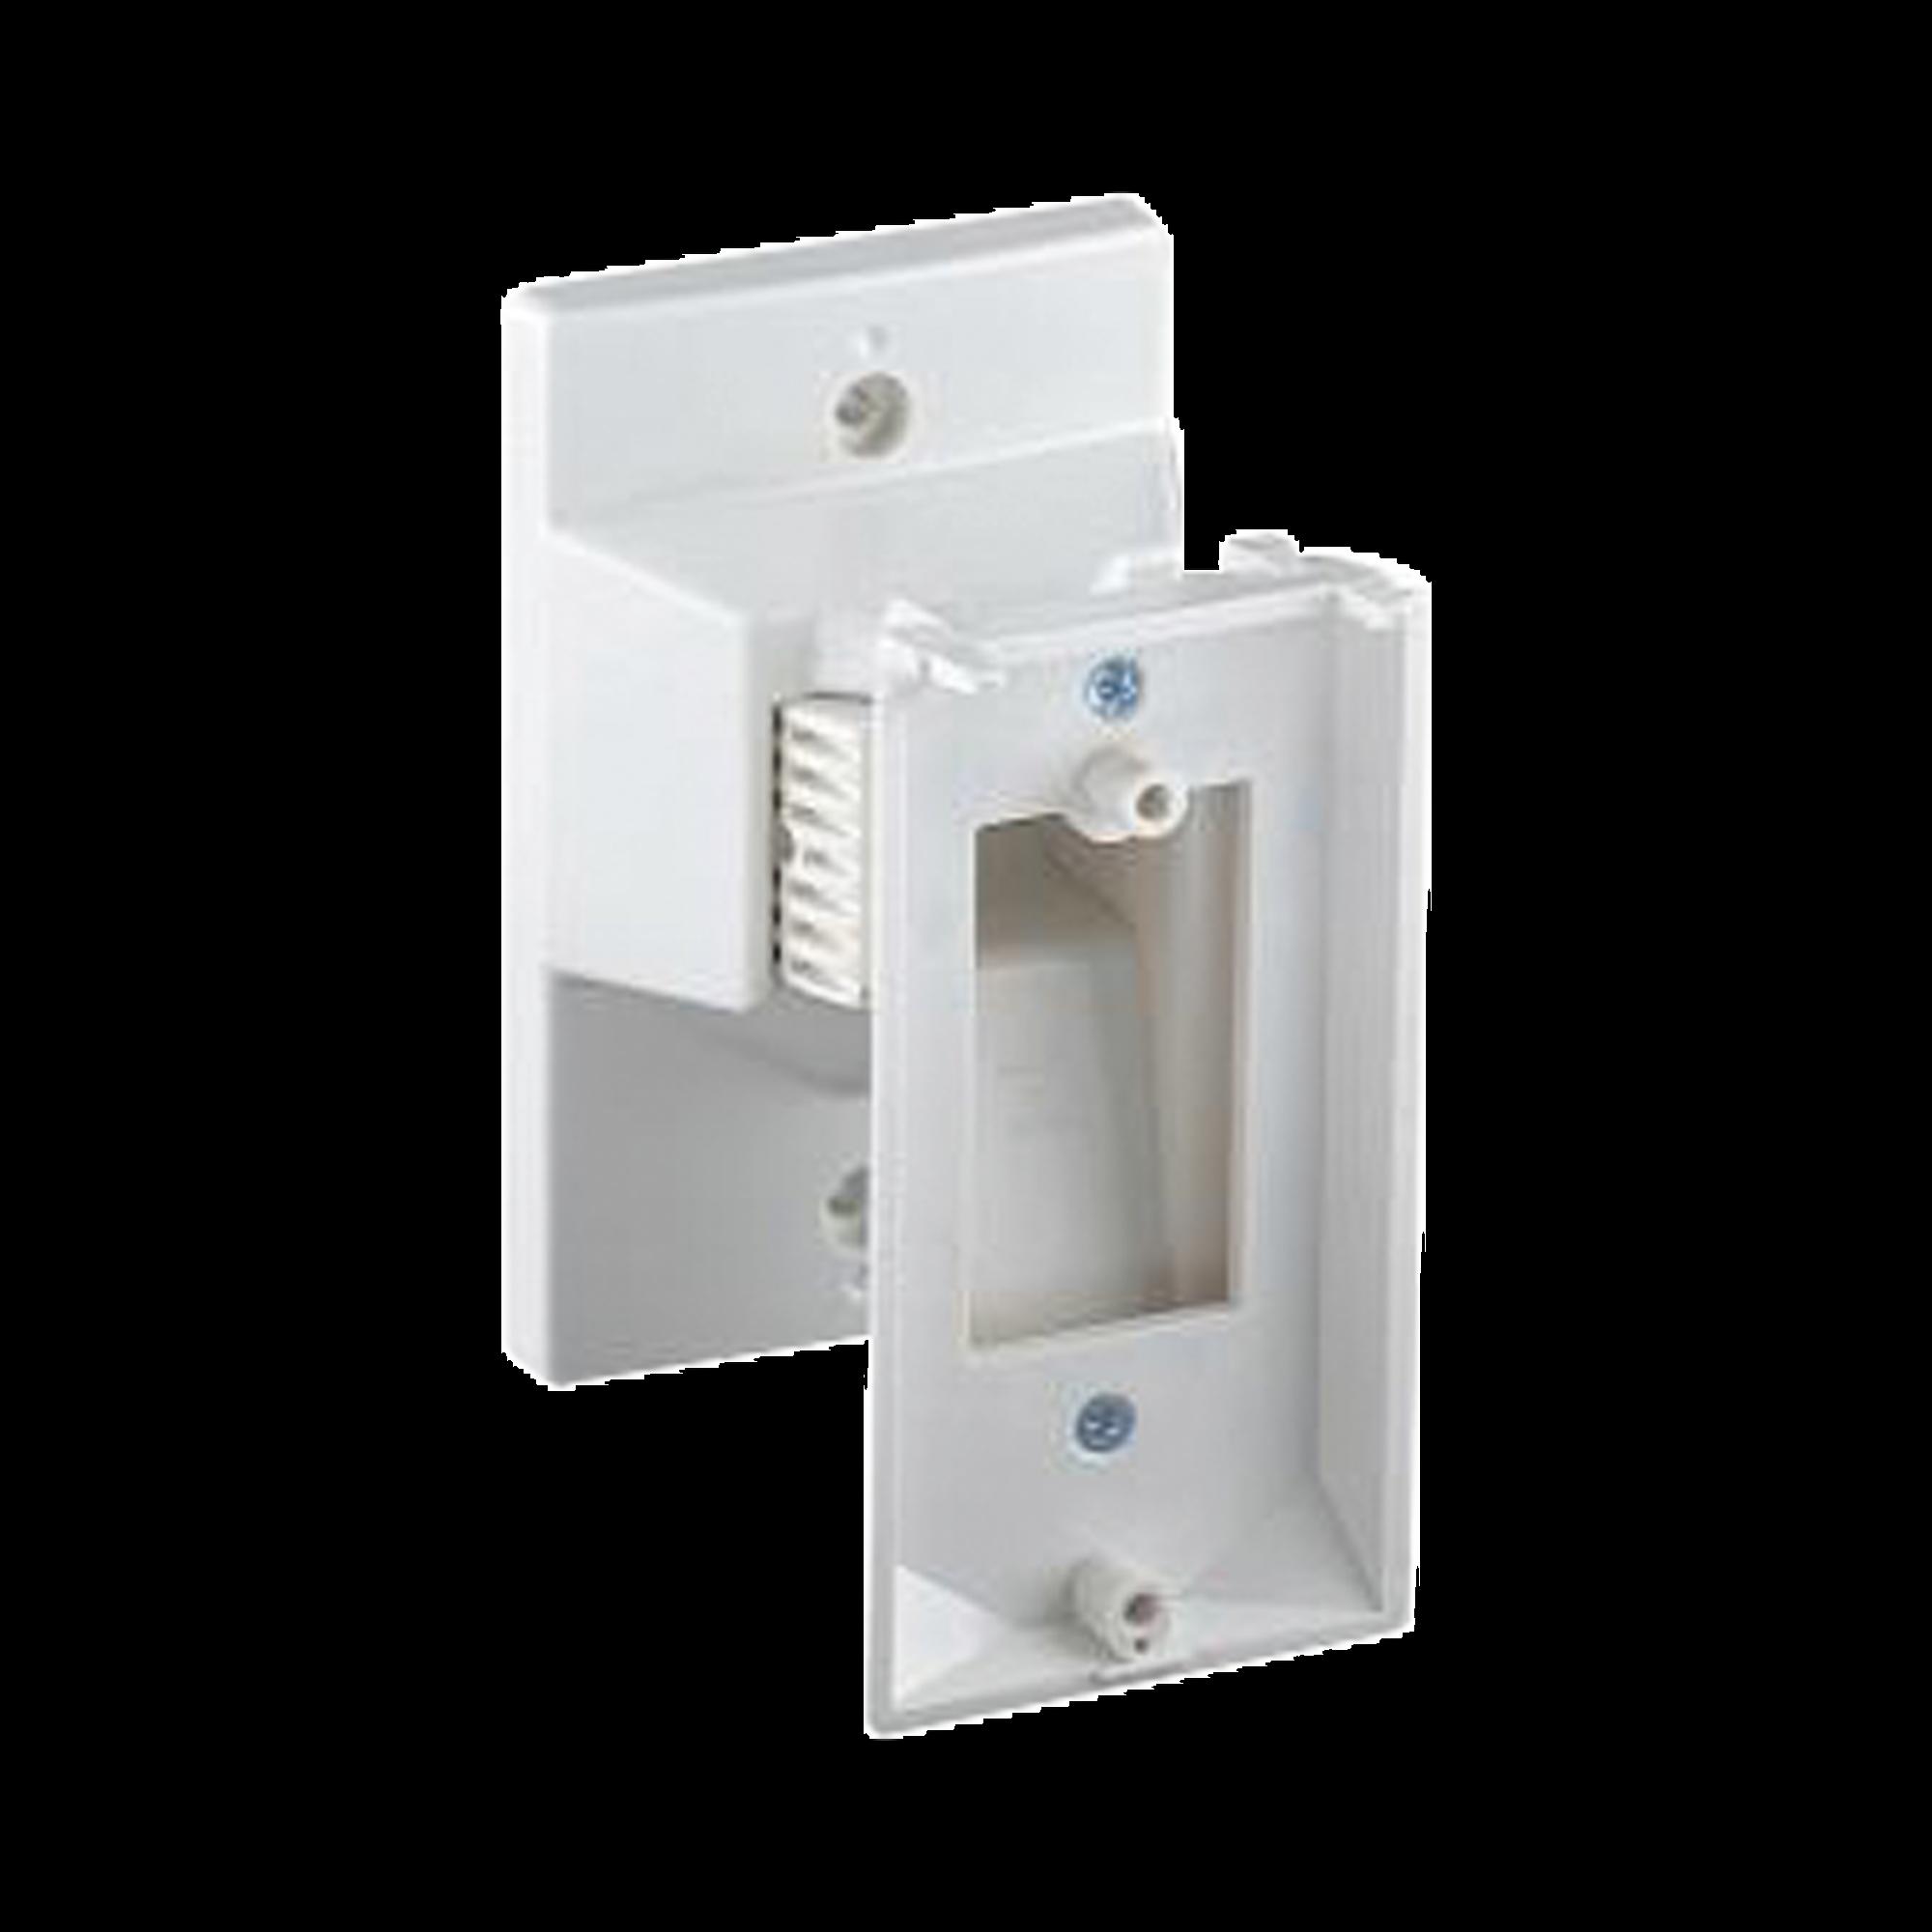 Montaje para Sensores Optex, serie LX/CX / Compatible con LX-402 / QXI Series